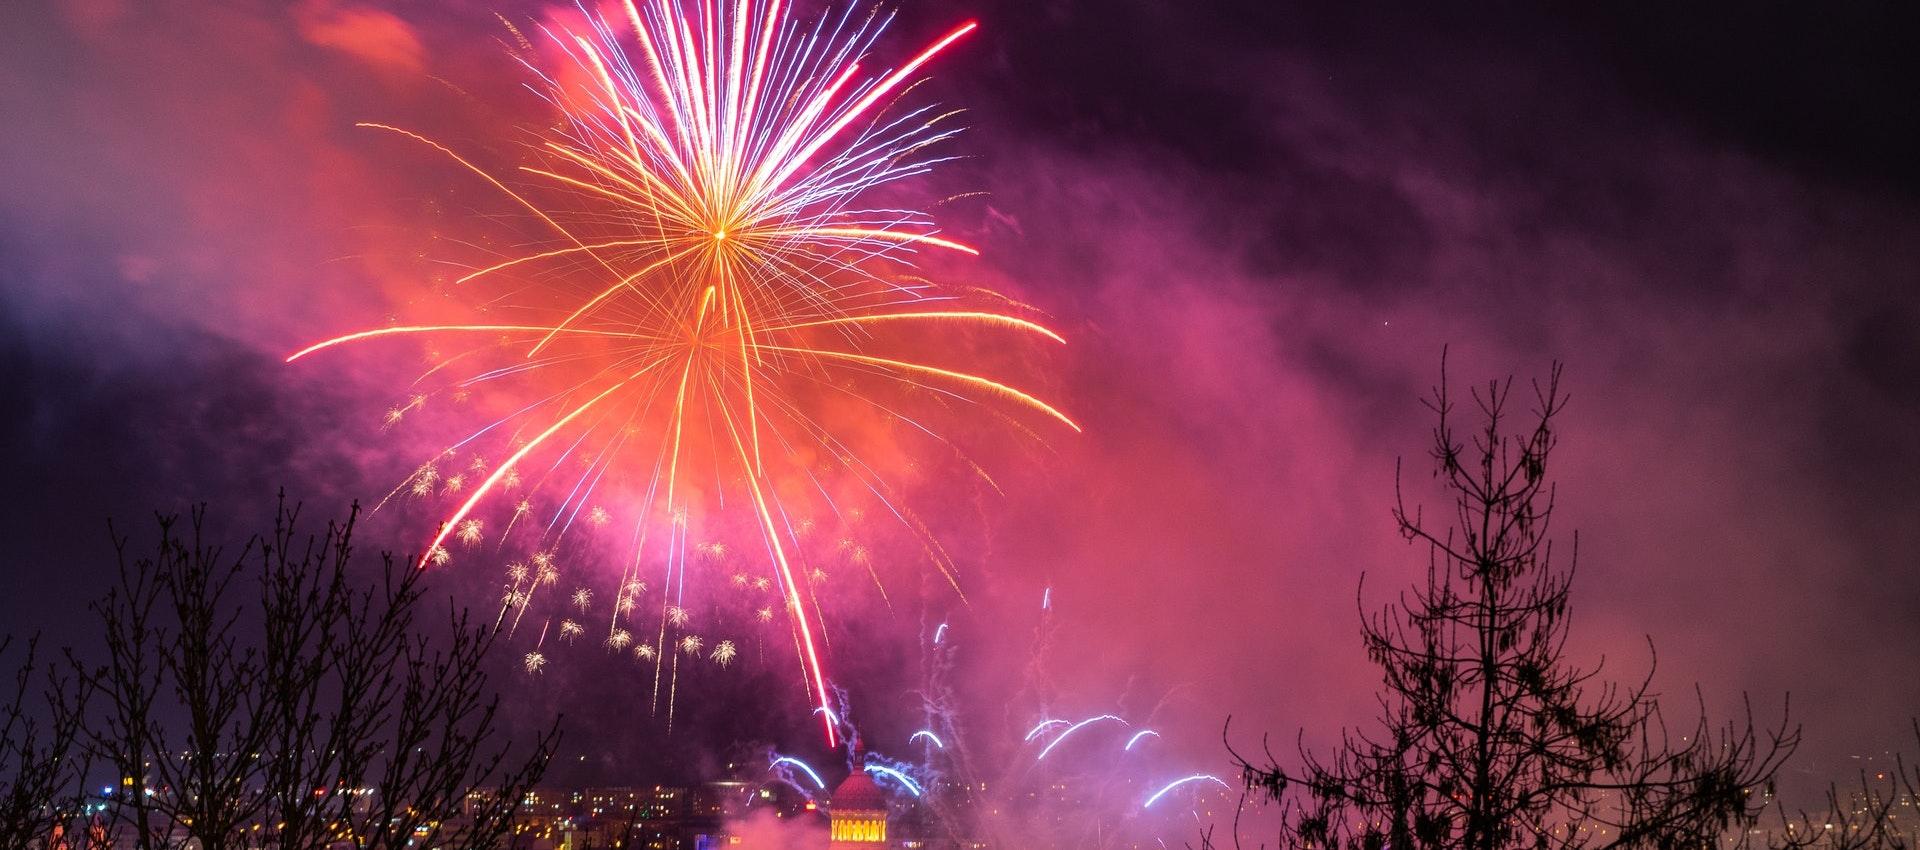 burj khalifa fireworks